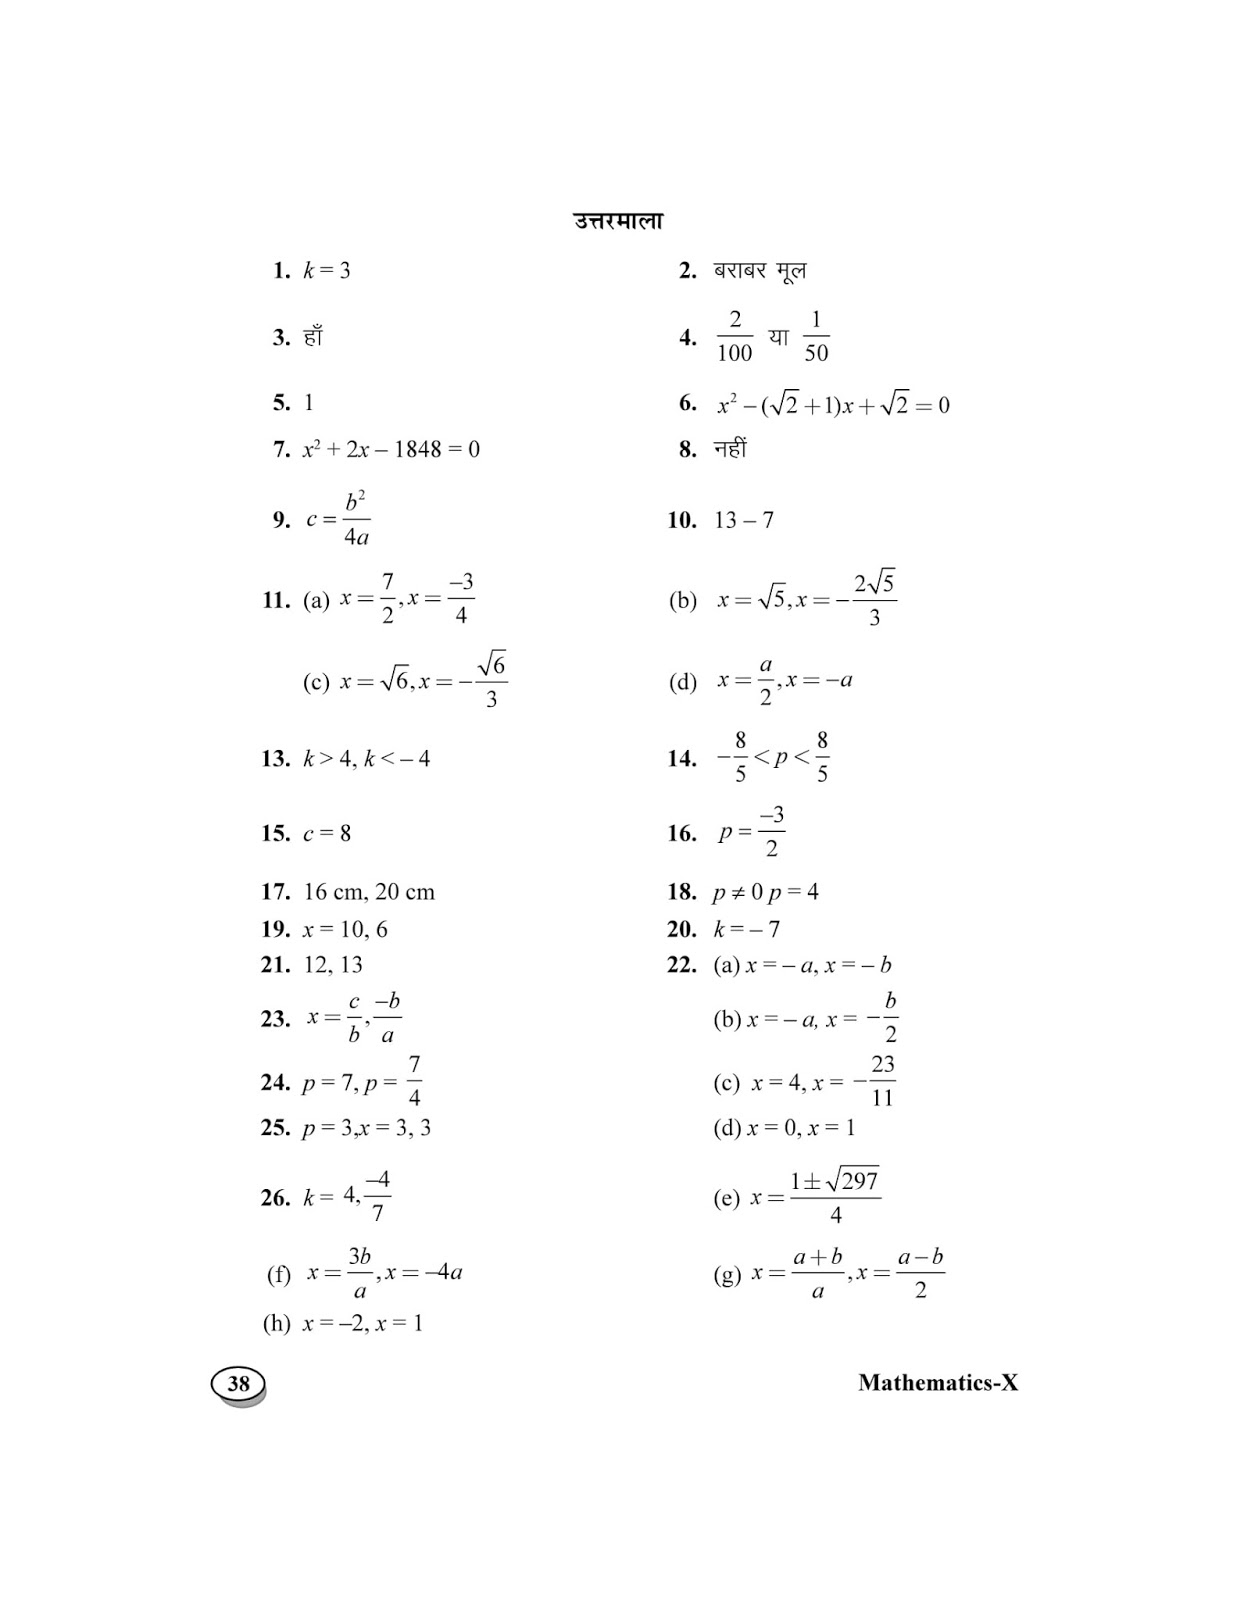 कक्षा 10 द्विघात समीकरण महत्वपूर्ण प्रश्न Archives